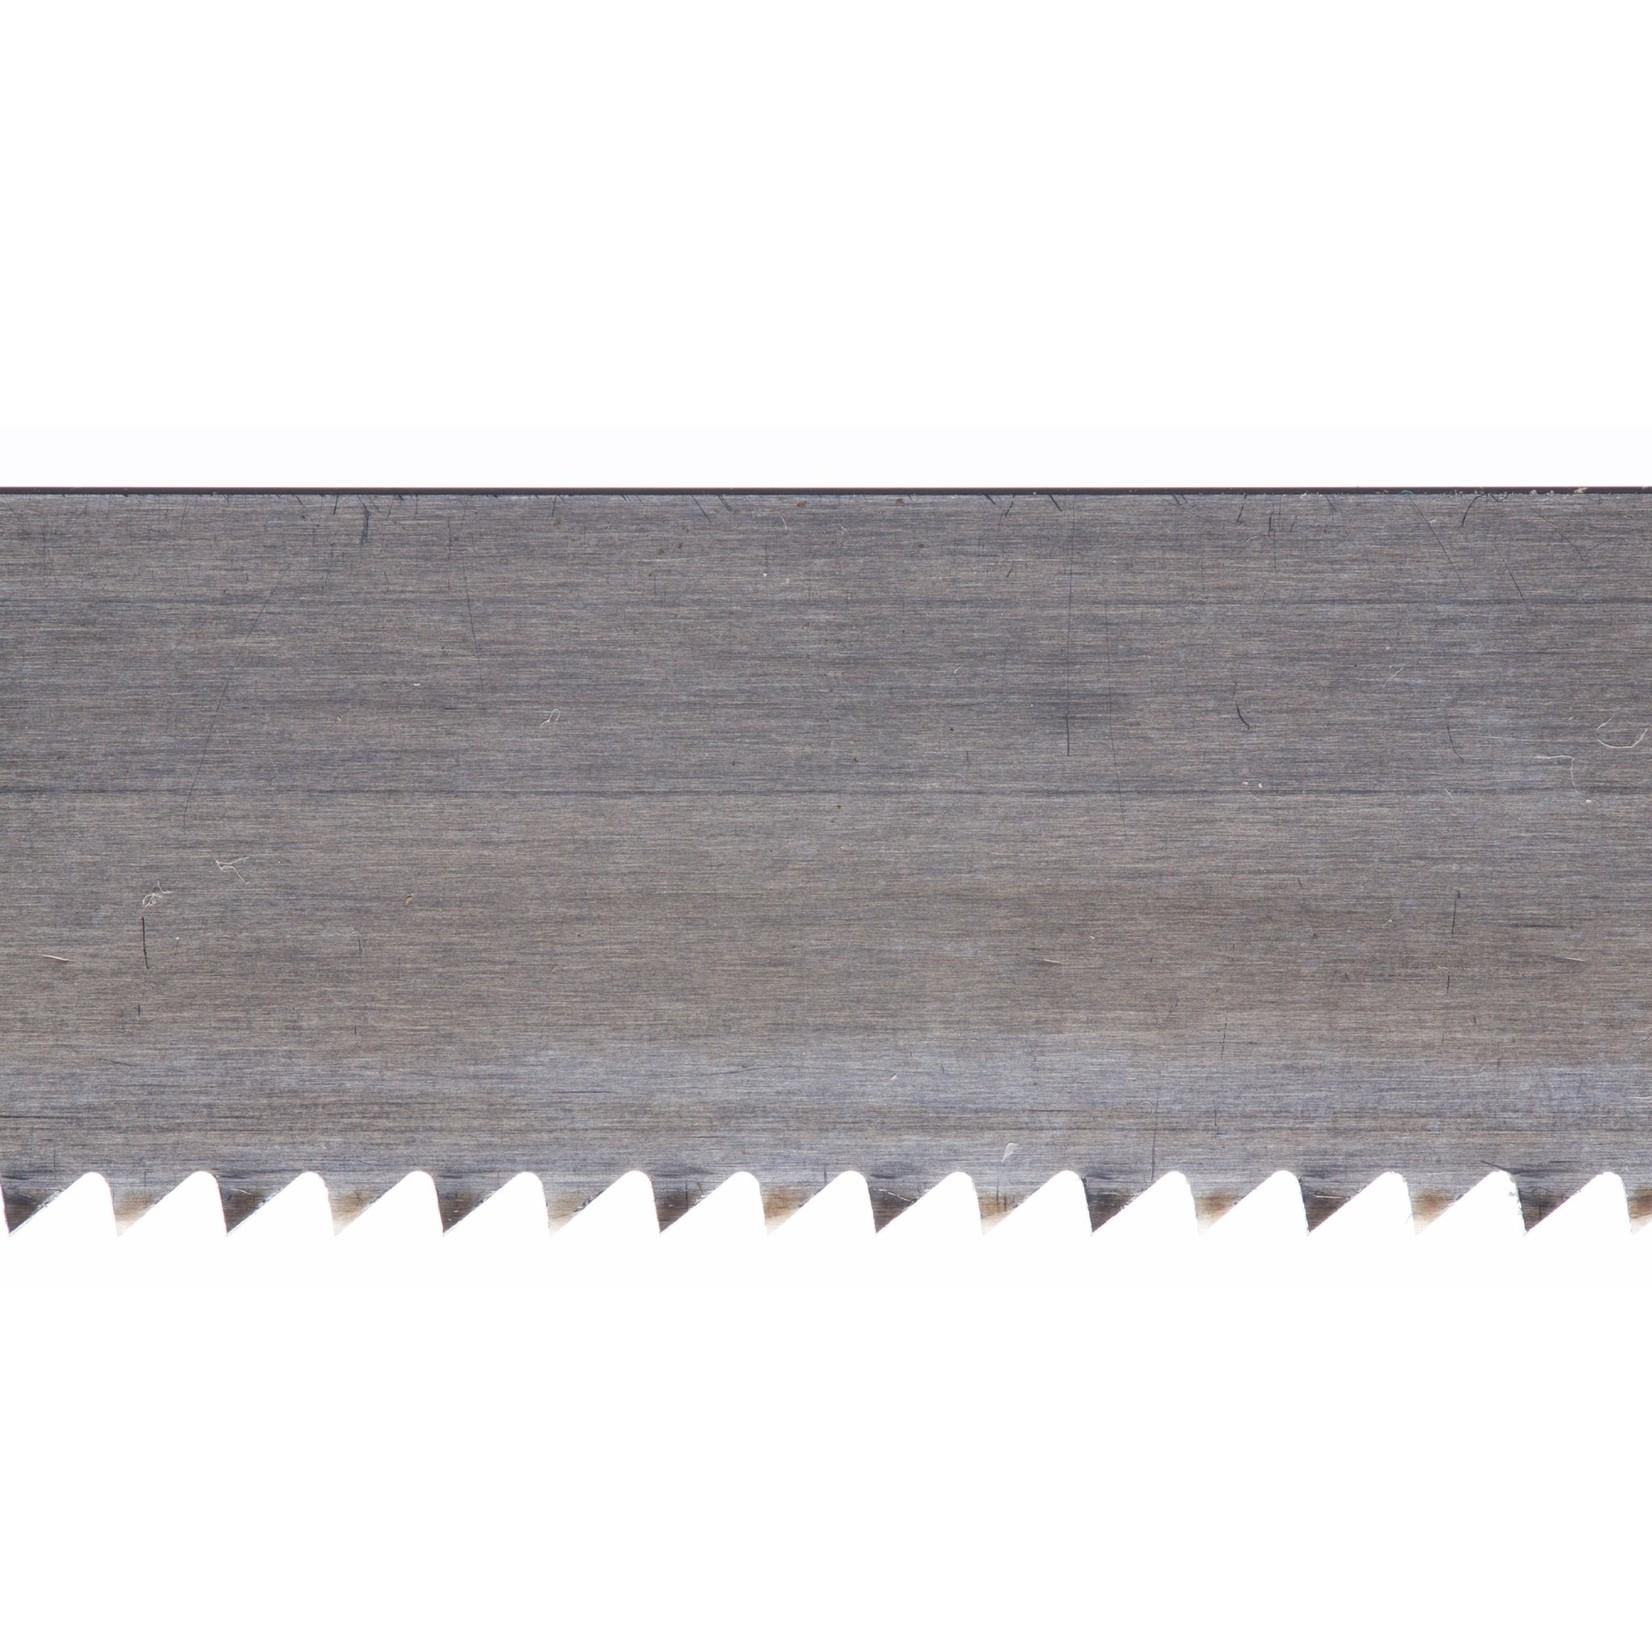 Agawa Boreal Replacement Blades